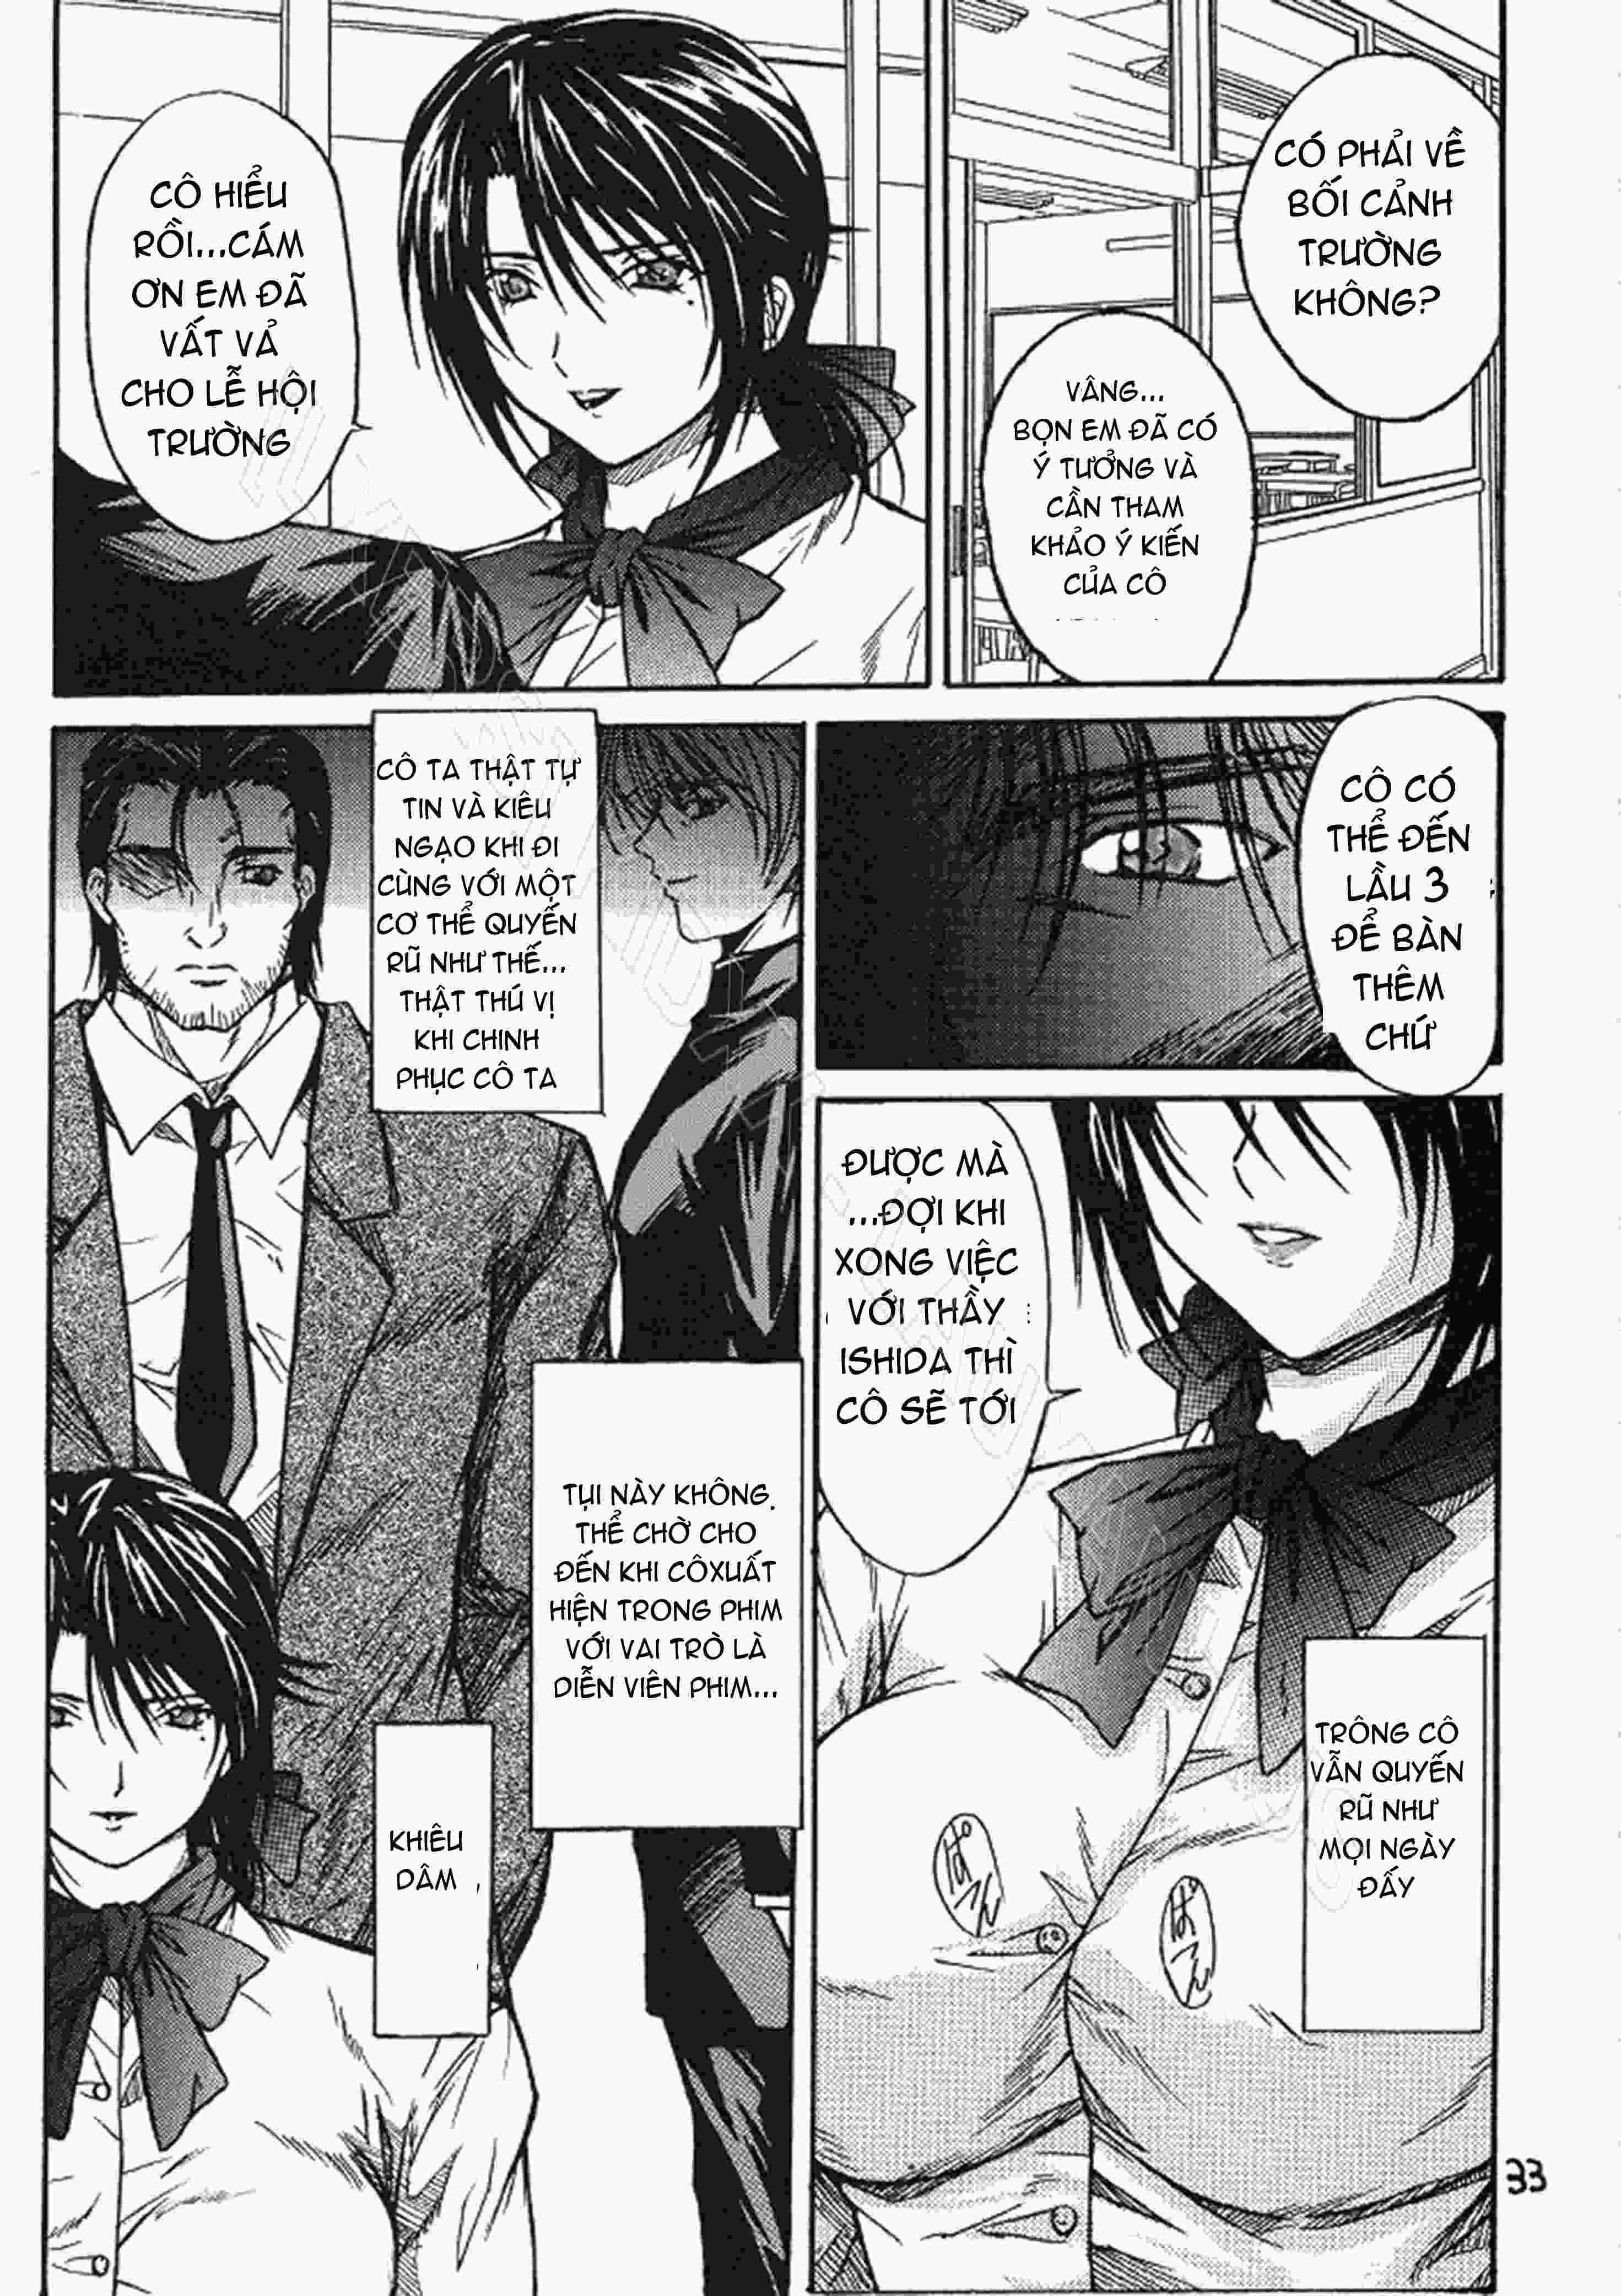 TruyenHay.Com - Ảnh 32 - Ryoujoku Rensa Chapter 1